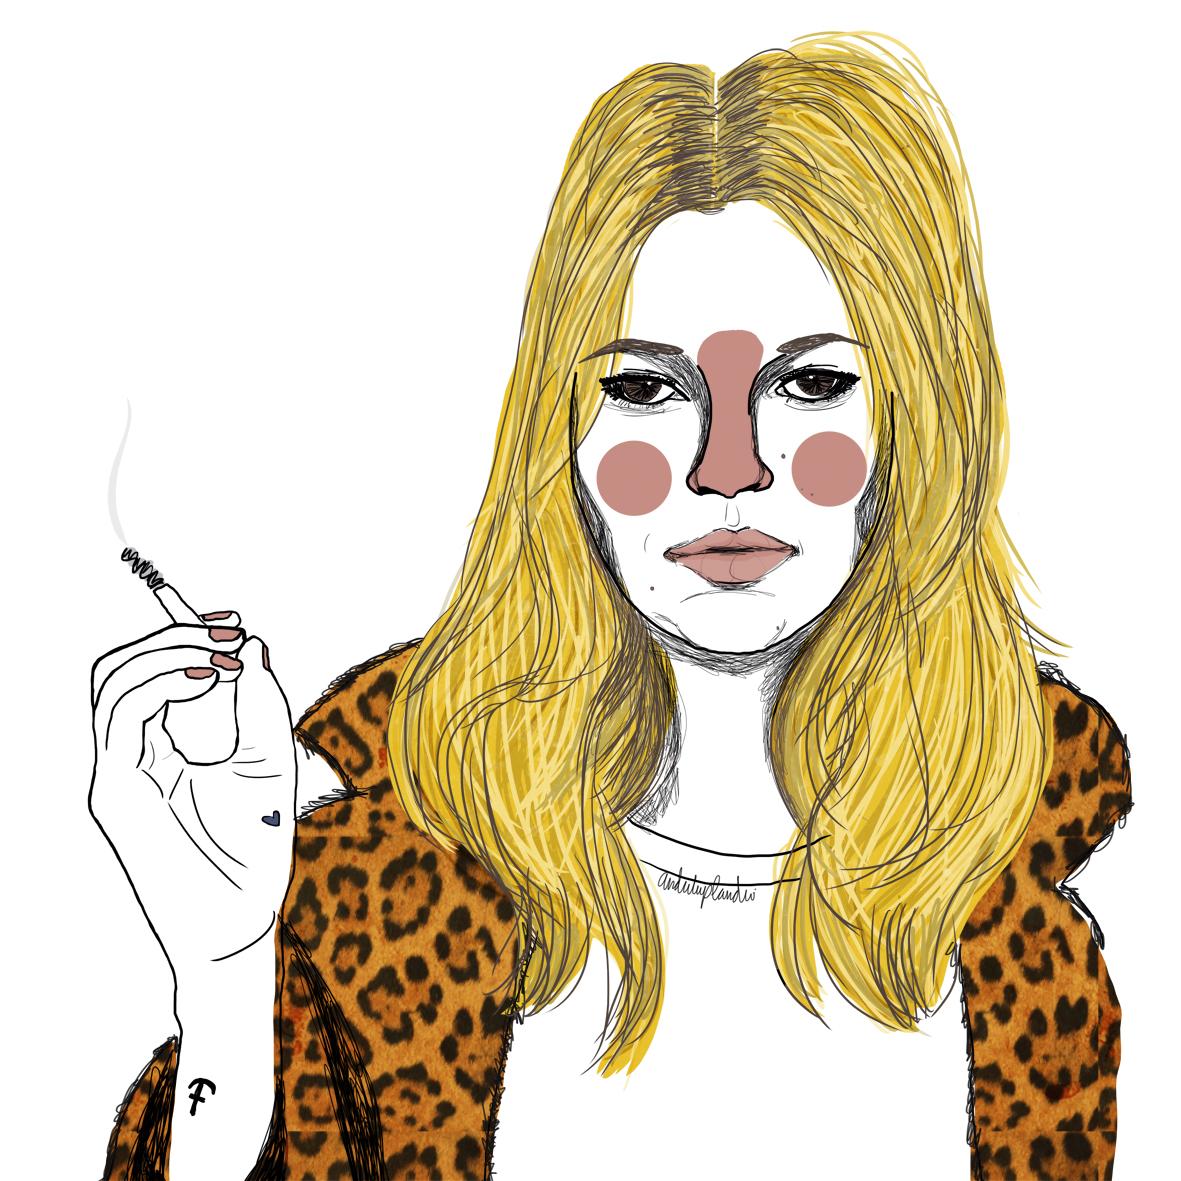 La model Kate Moo, en una il·lustració d'Elisabet Díez 'Anduluplandu'